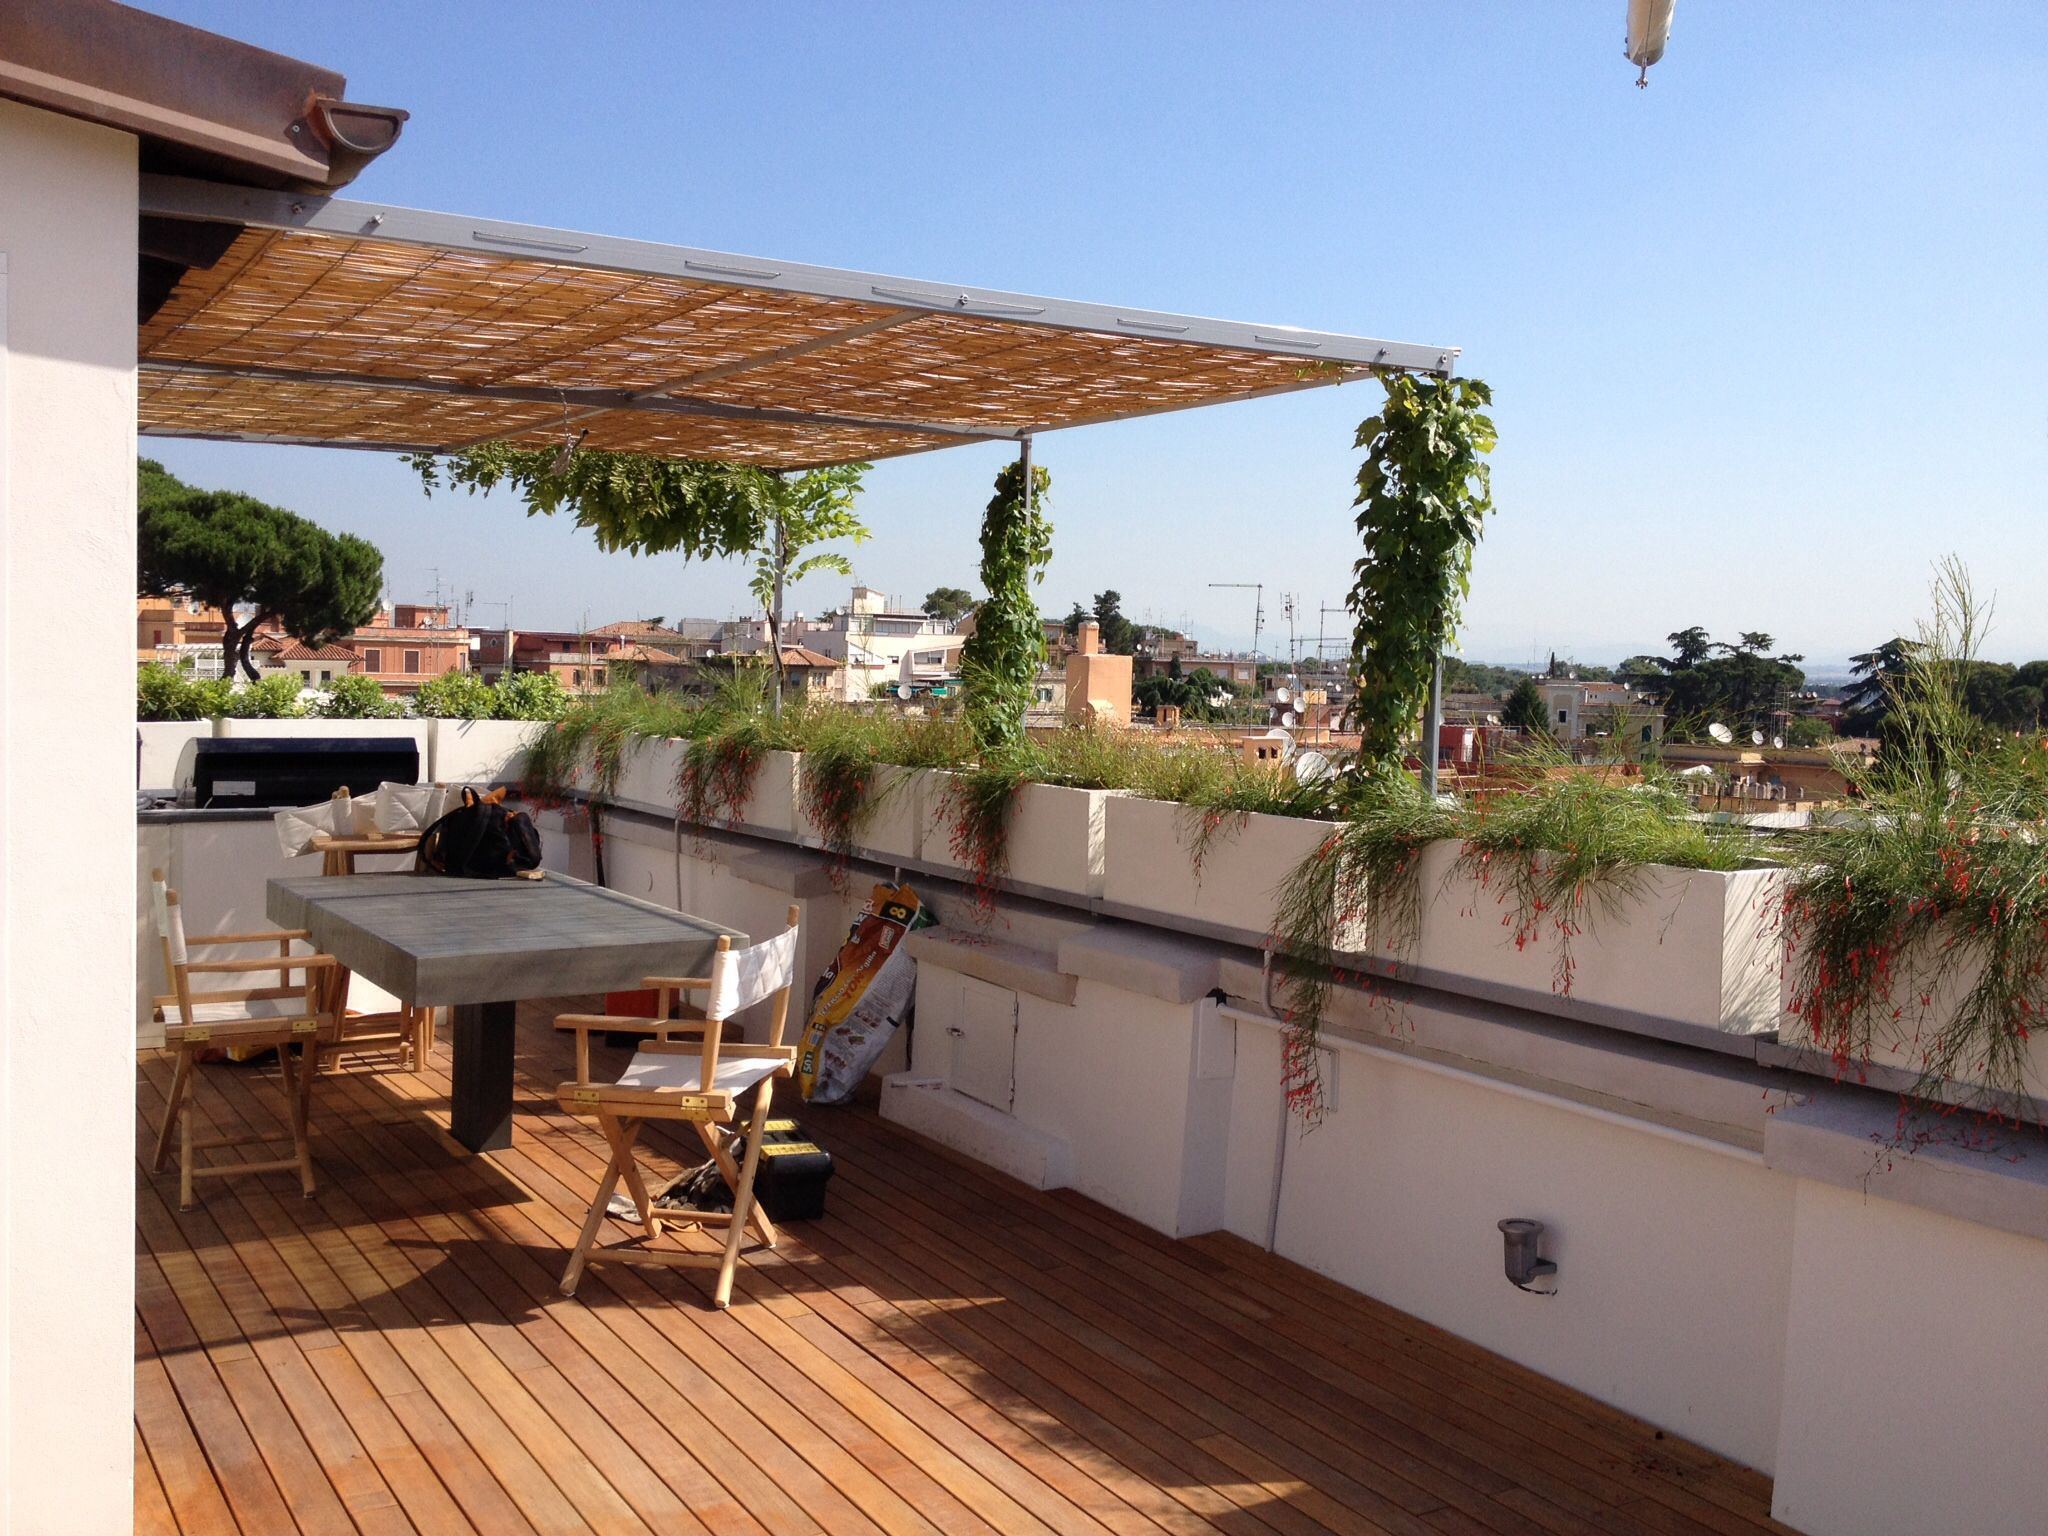 Terrazza romana barca e tavolo | lorenza bartolazzi gardens ...